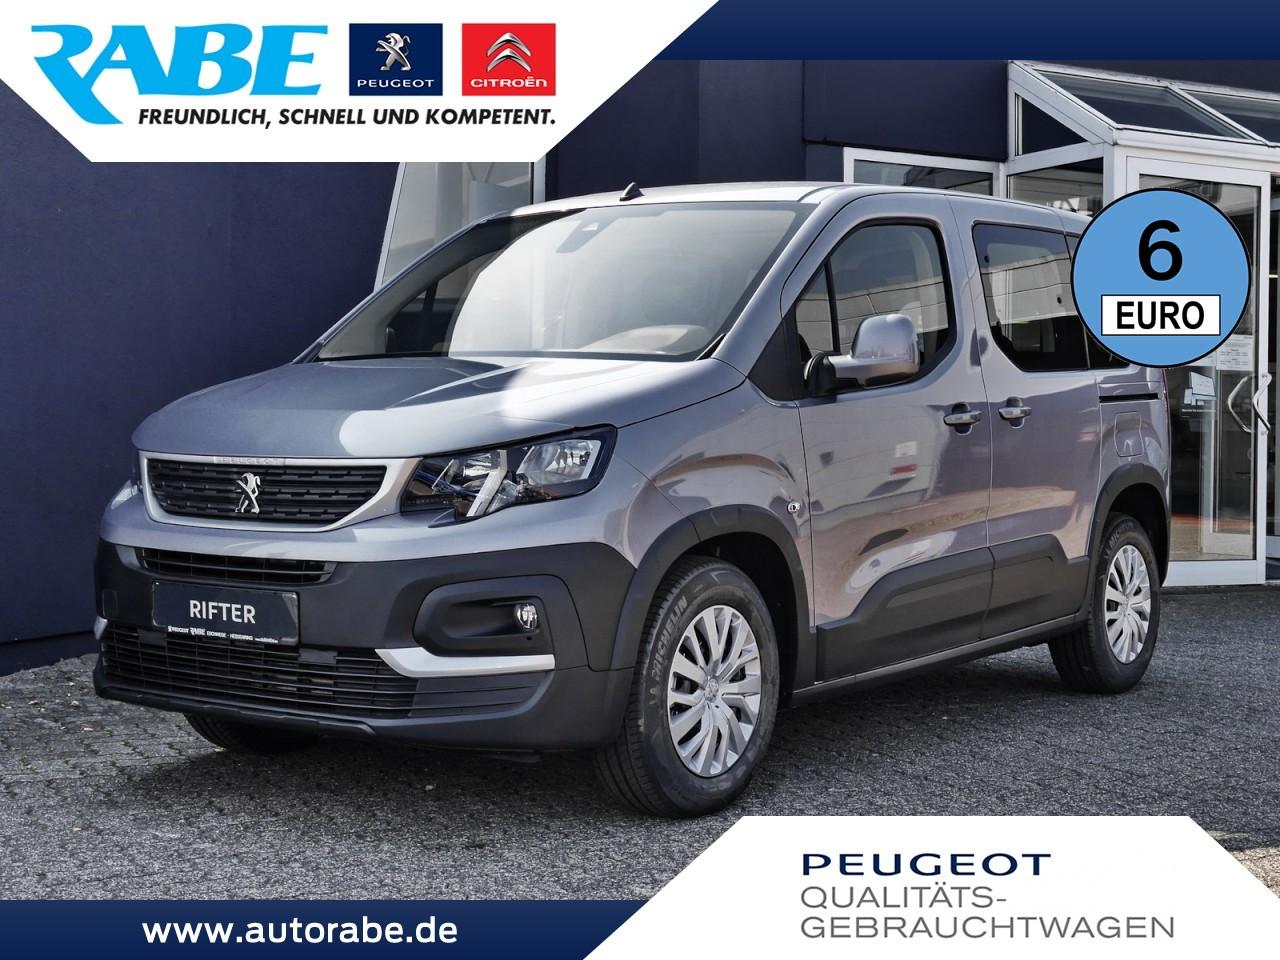 Peugeot Rifter Active L1 110 PT Klima+Sitzheizung+AHK, Jahr 2020, Benzin